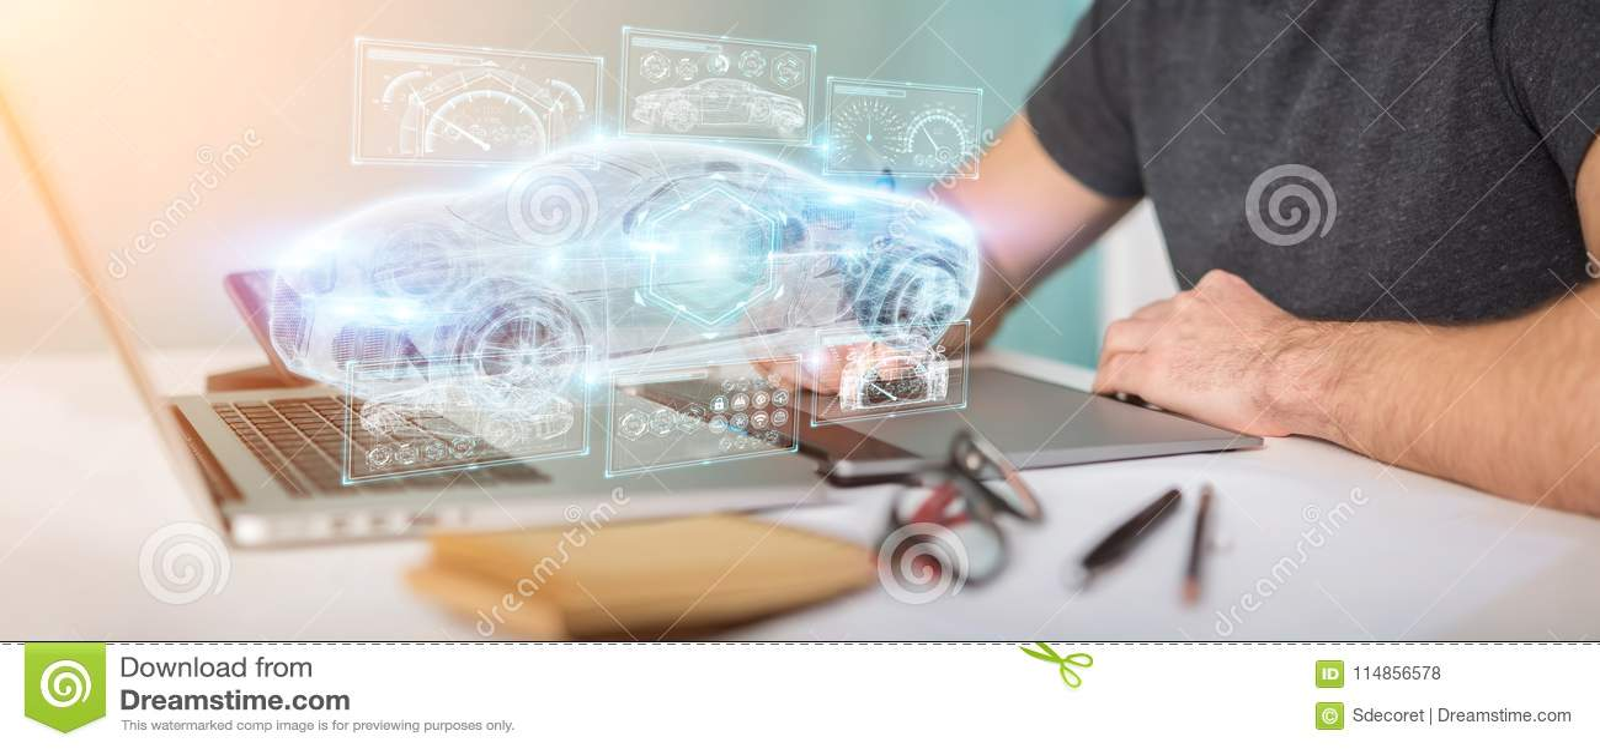 Graphic designer using modern smart car interface 3D rendering